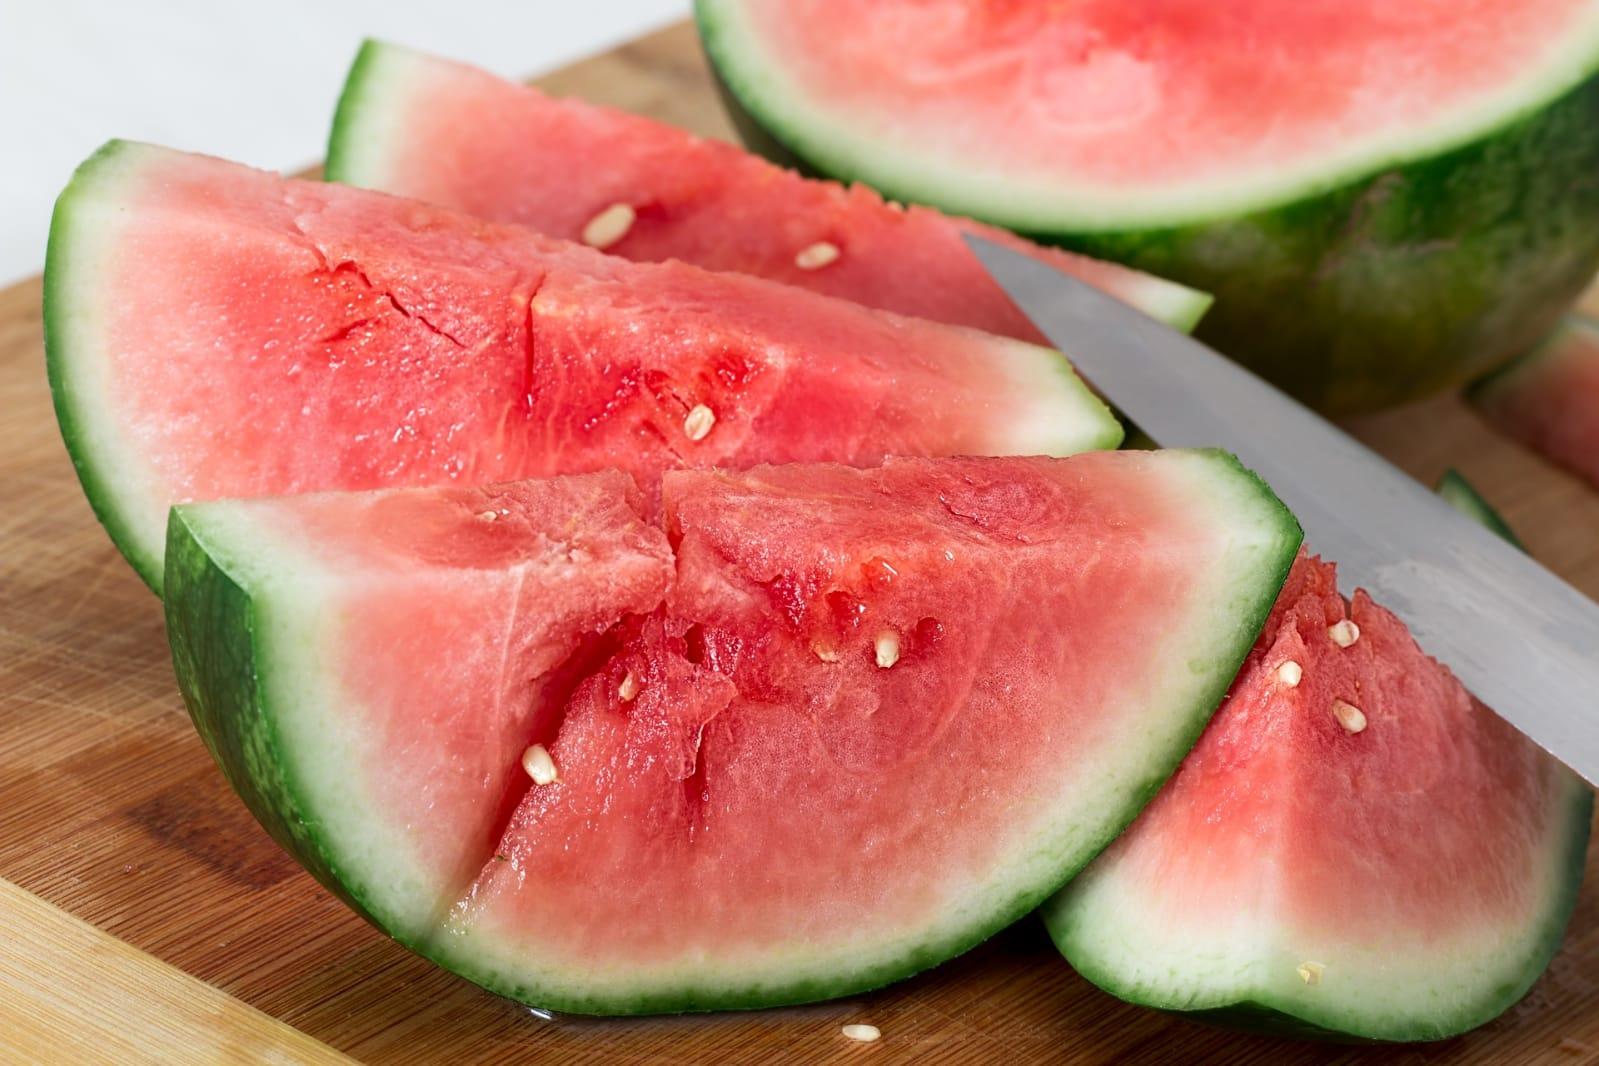 Buah semangka yang kaya akan manfaat. Credit: Pixabay